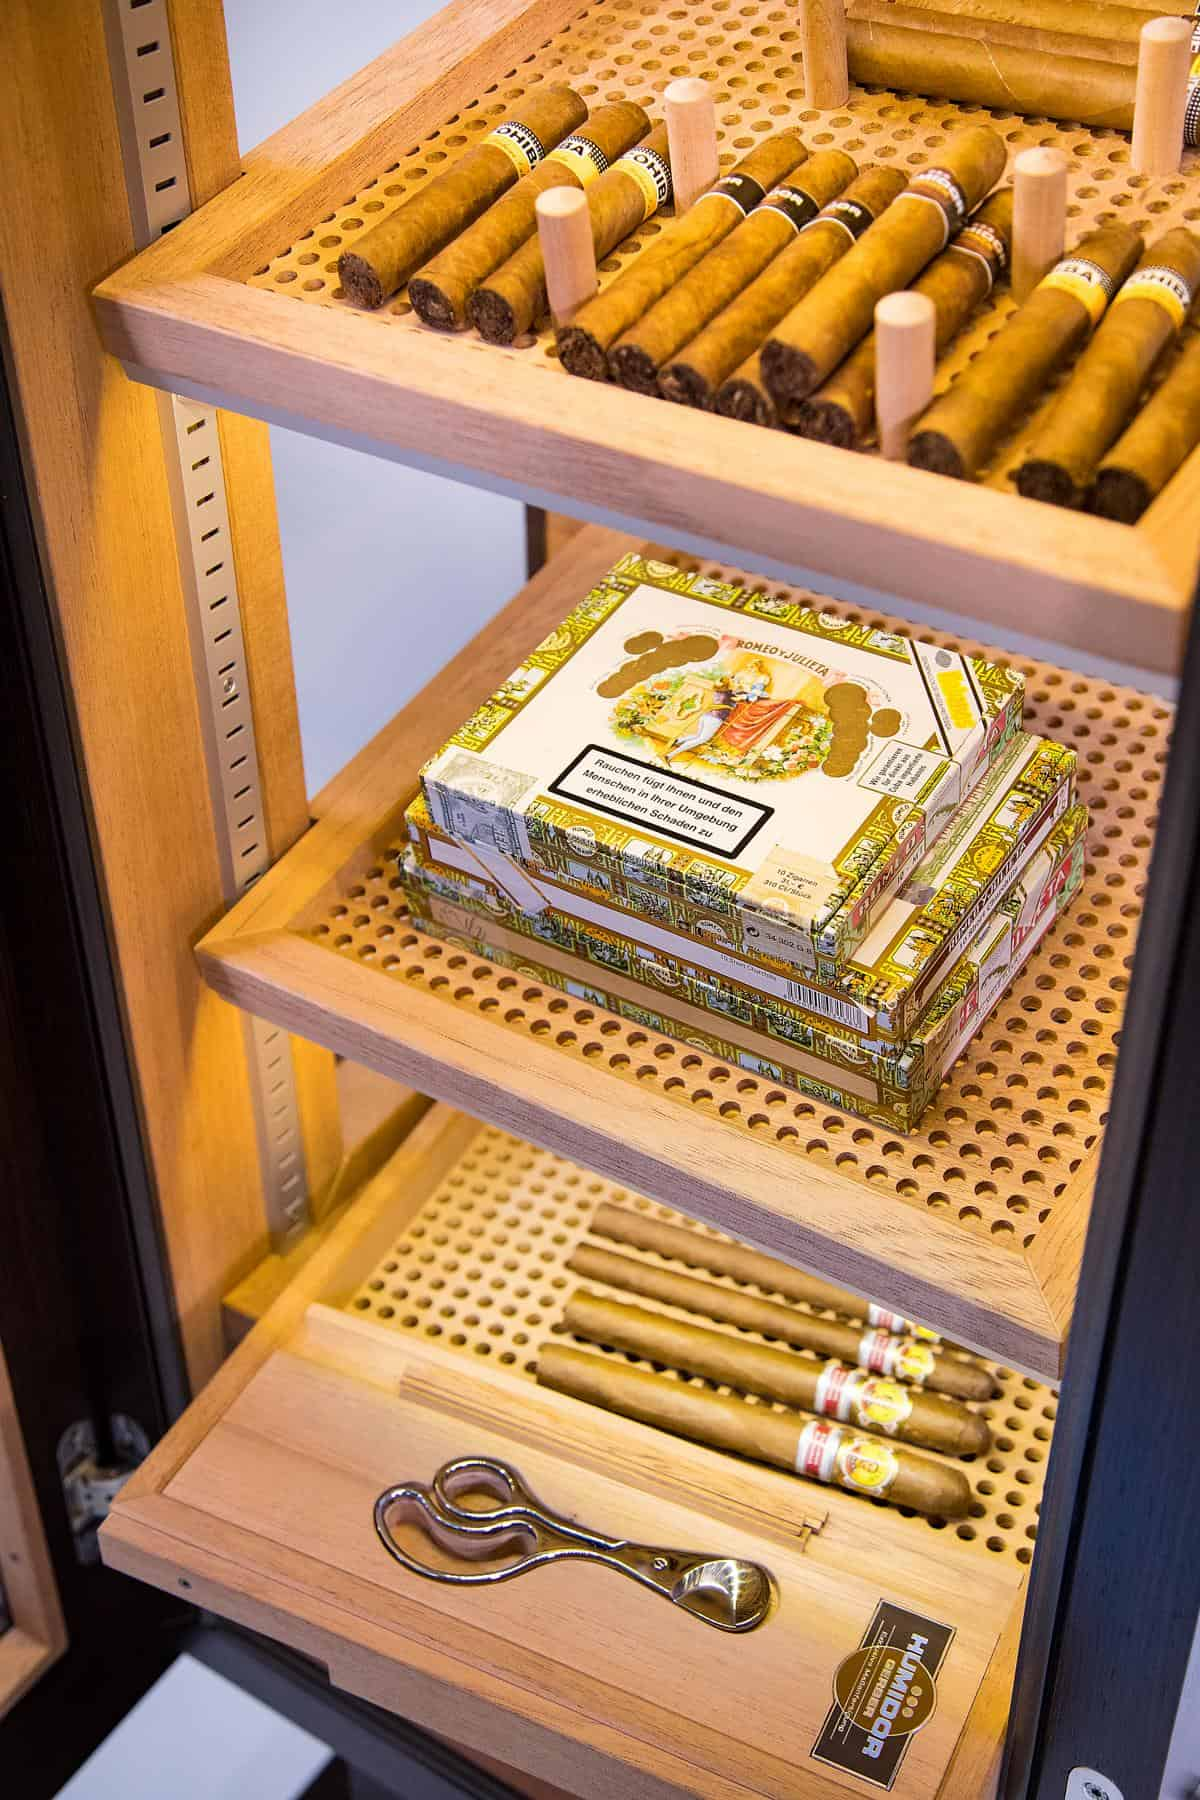 GERBER Humidor CigarArt Lighting